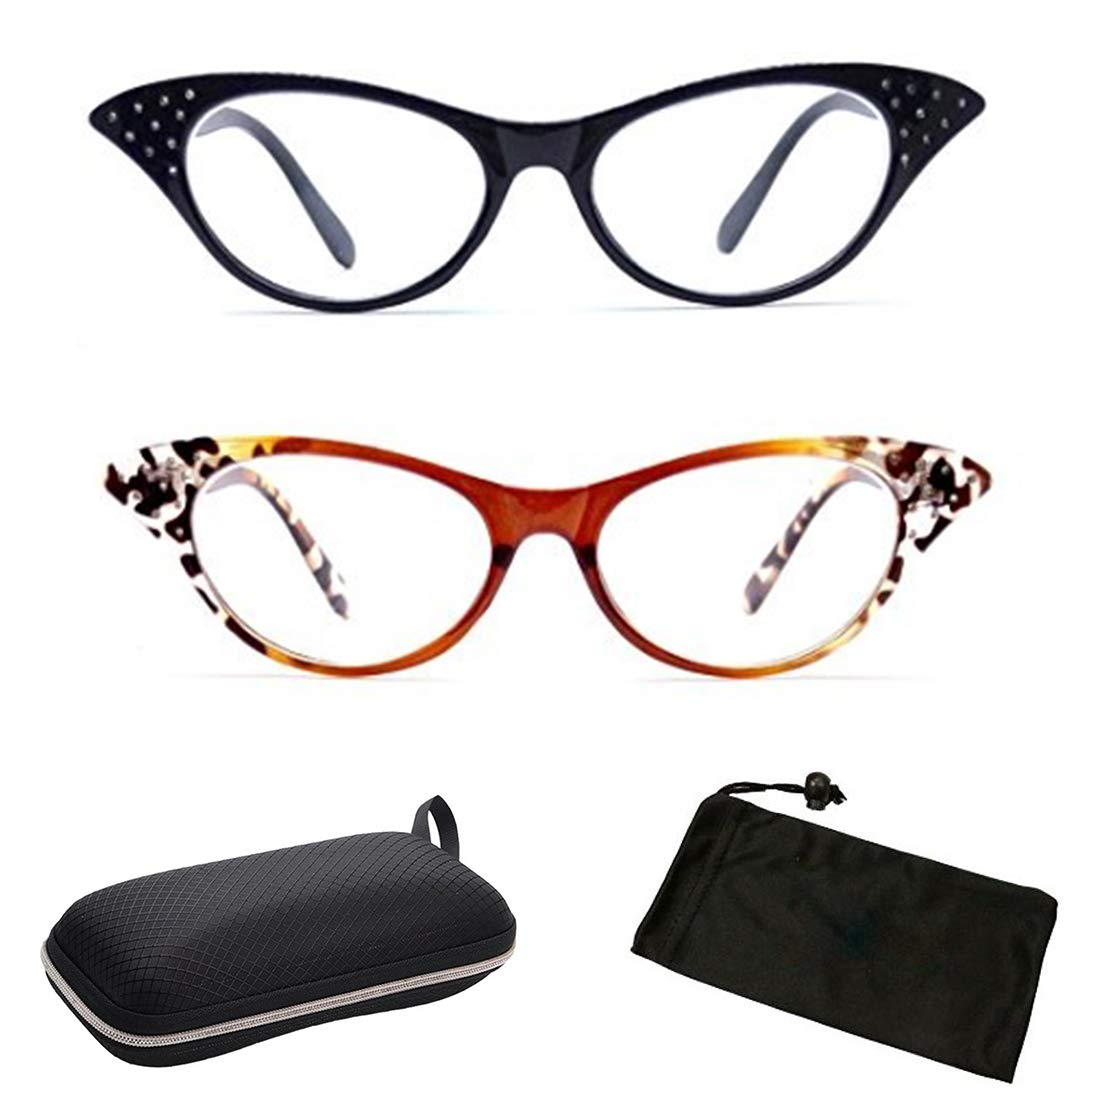 2c7e37ea4fc Cateye Retro Readers Reading Glasses for Women Female with Free Hard Case (Plastic  Frame) (Oval 70 s 80 s Shape) (Designer